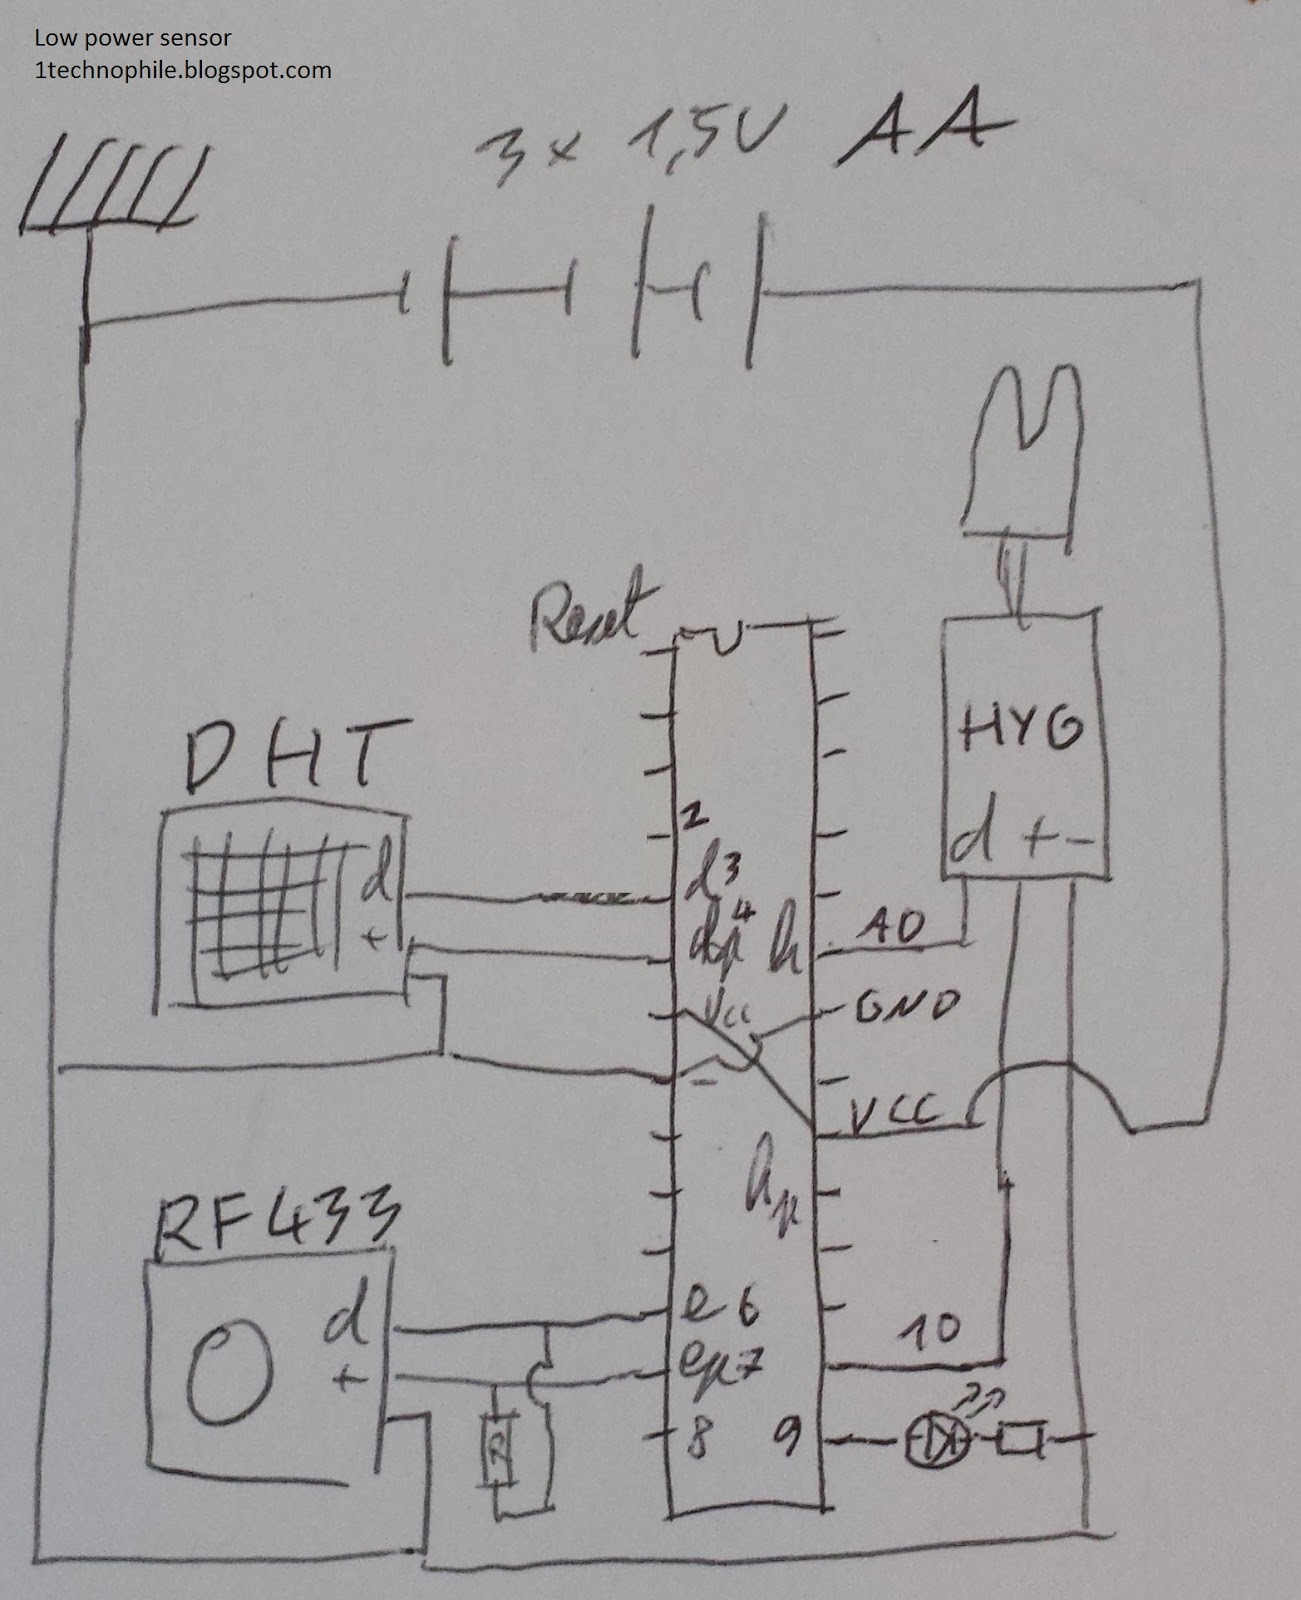 Low cost, low power 6uA garden 433Mhz sensor with temperature